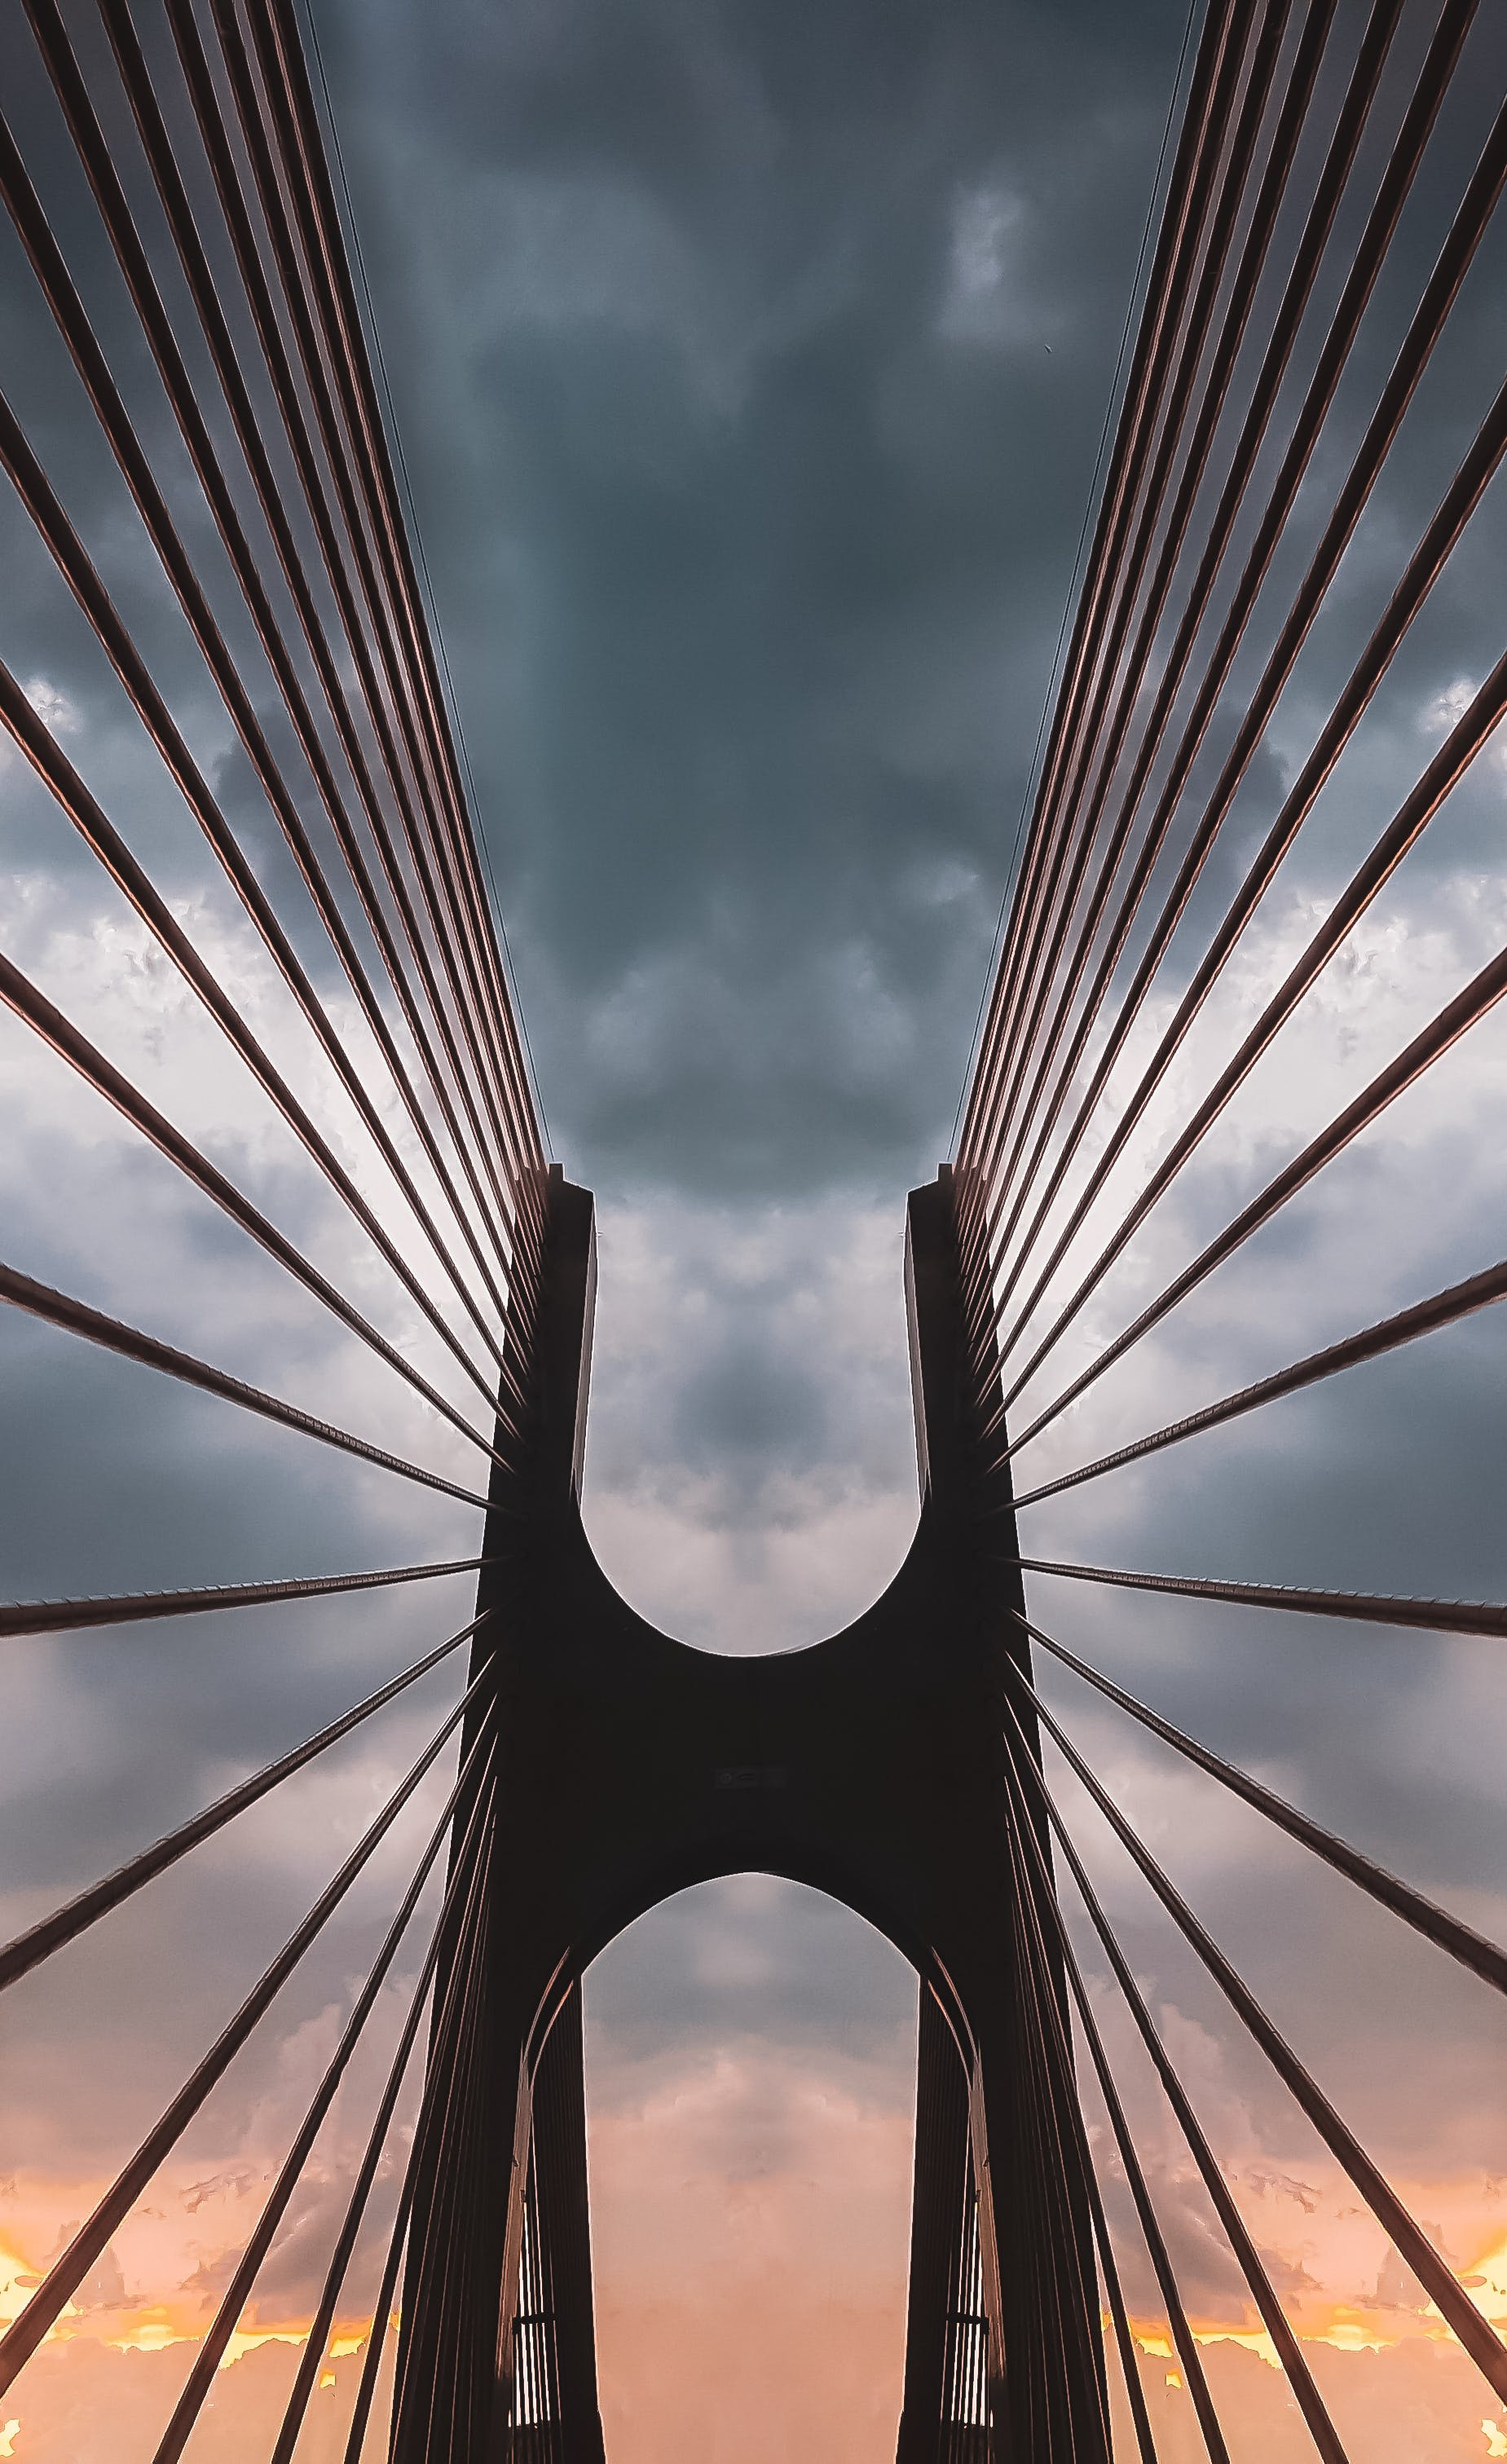 Low Angle Shot of a Suspension Bridge